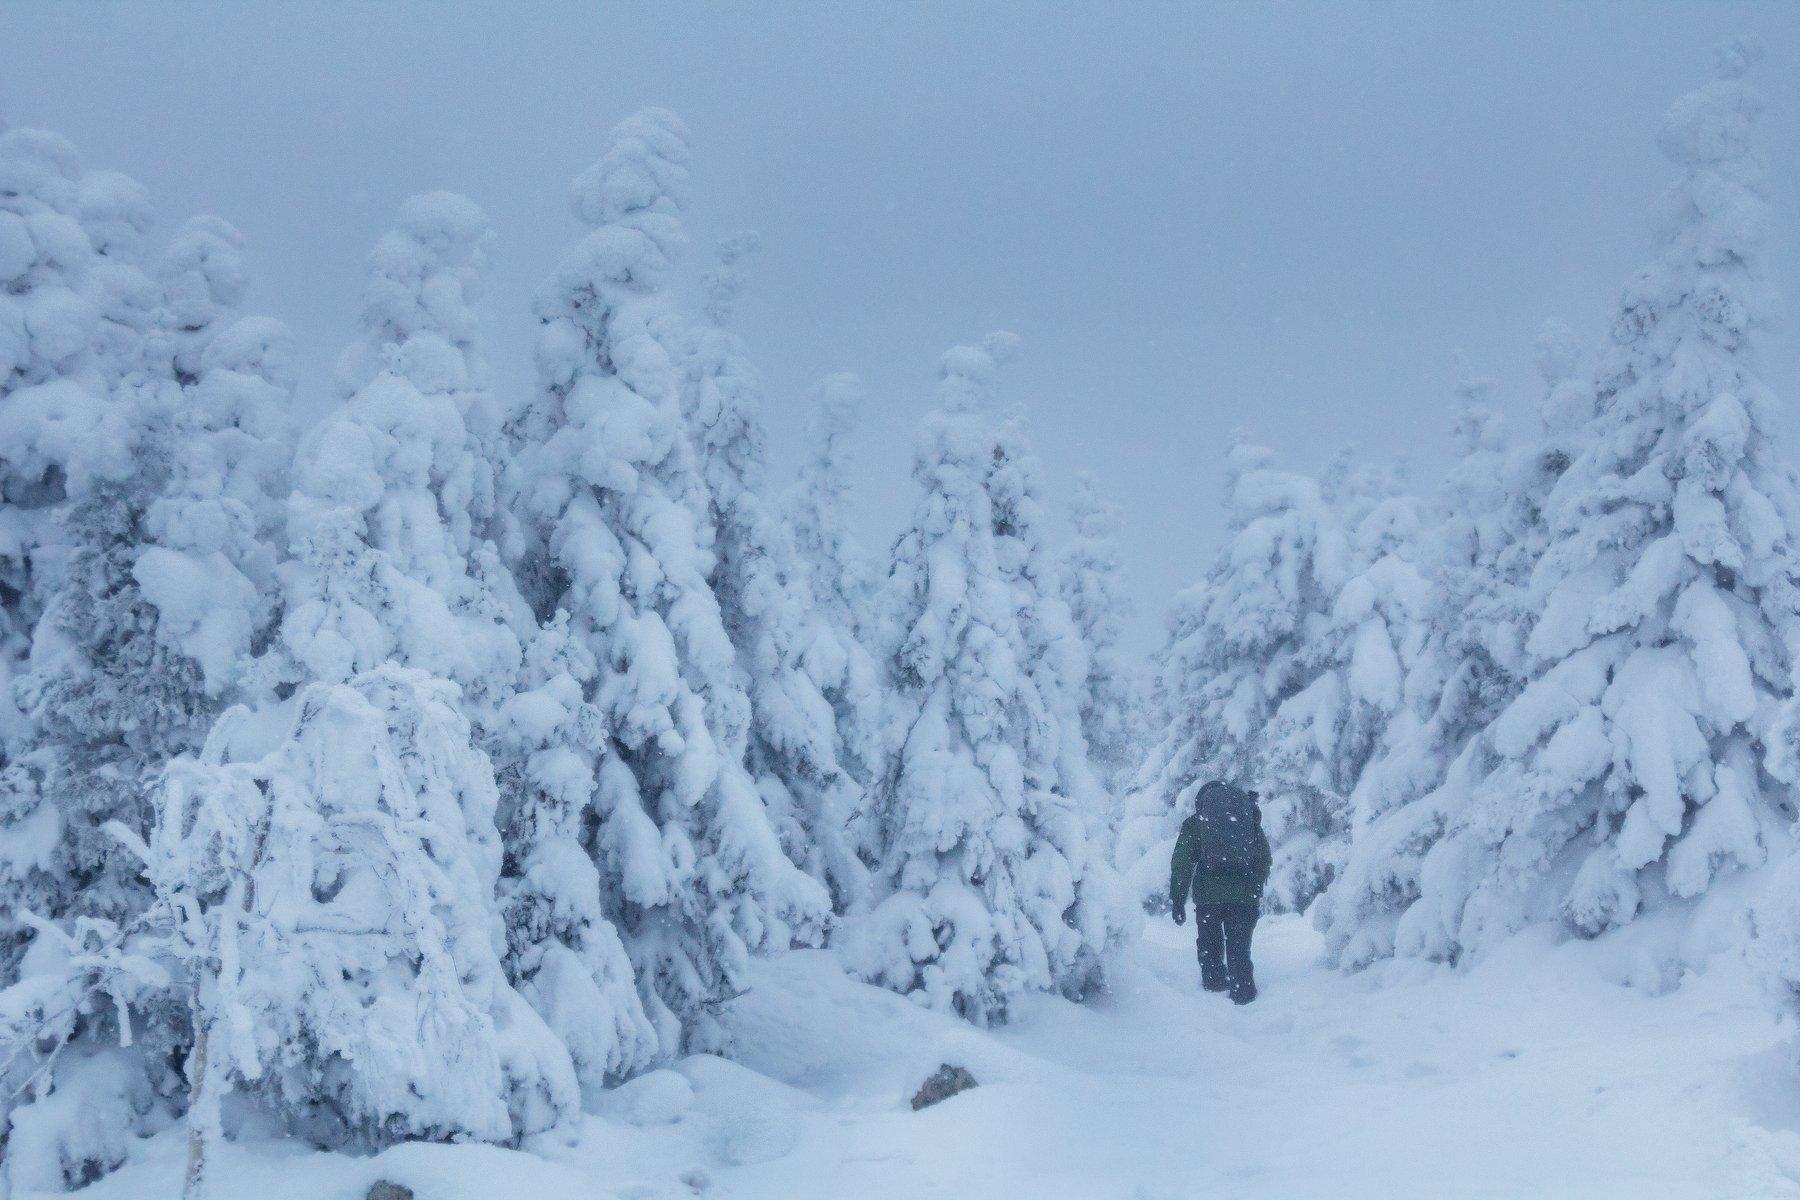 урал, южный урал, зюраткуль, зимний лес, зима, путешественник, турист, Сергей Гарифуллин